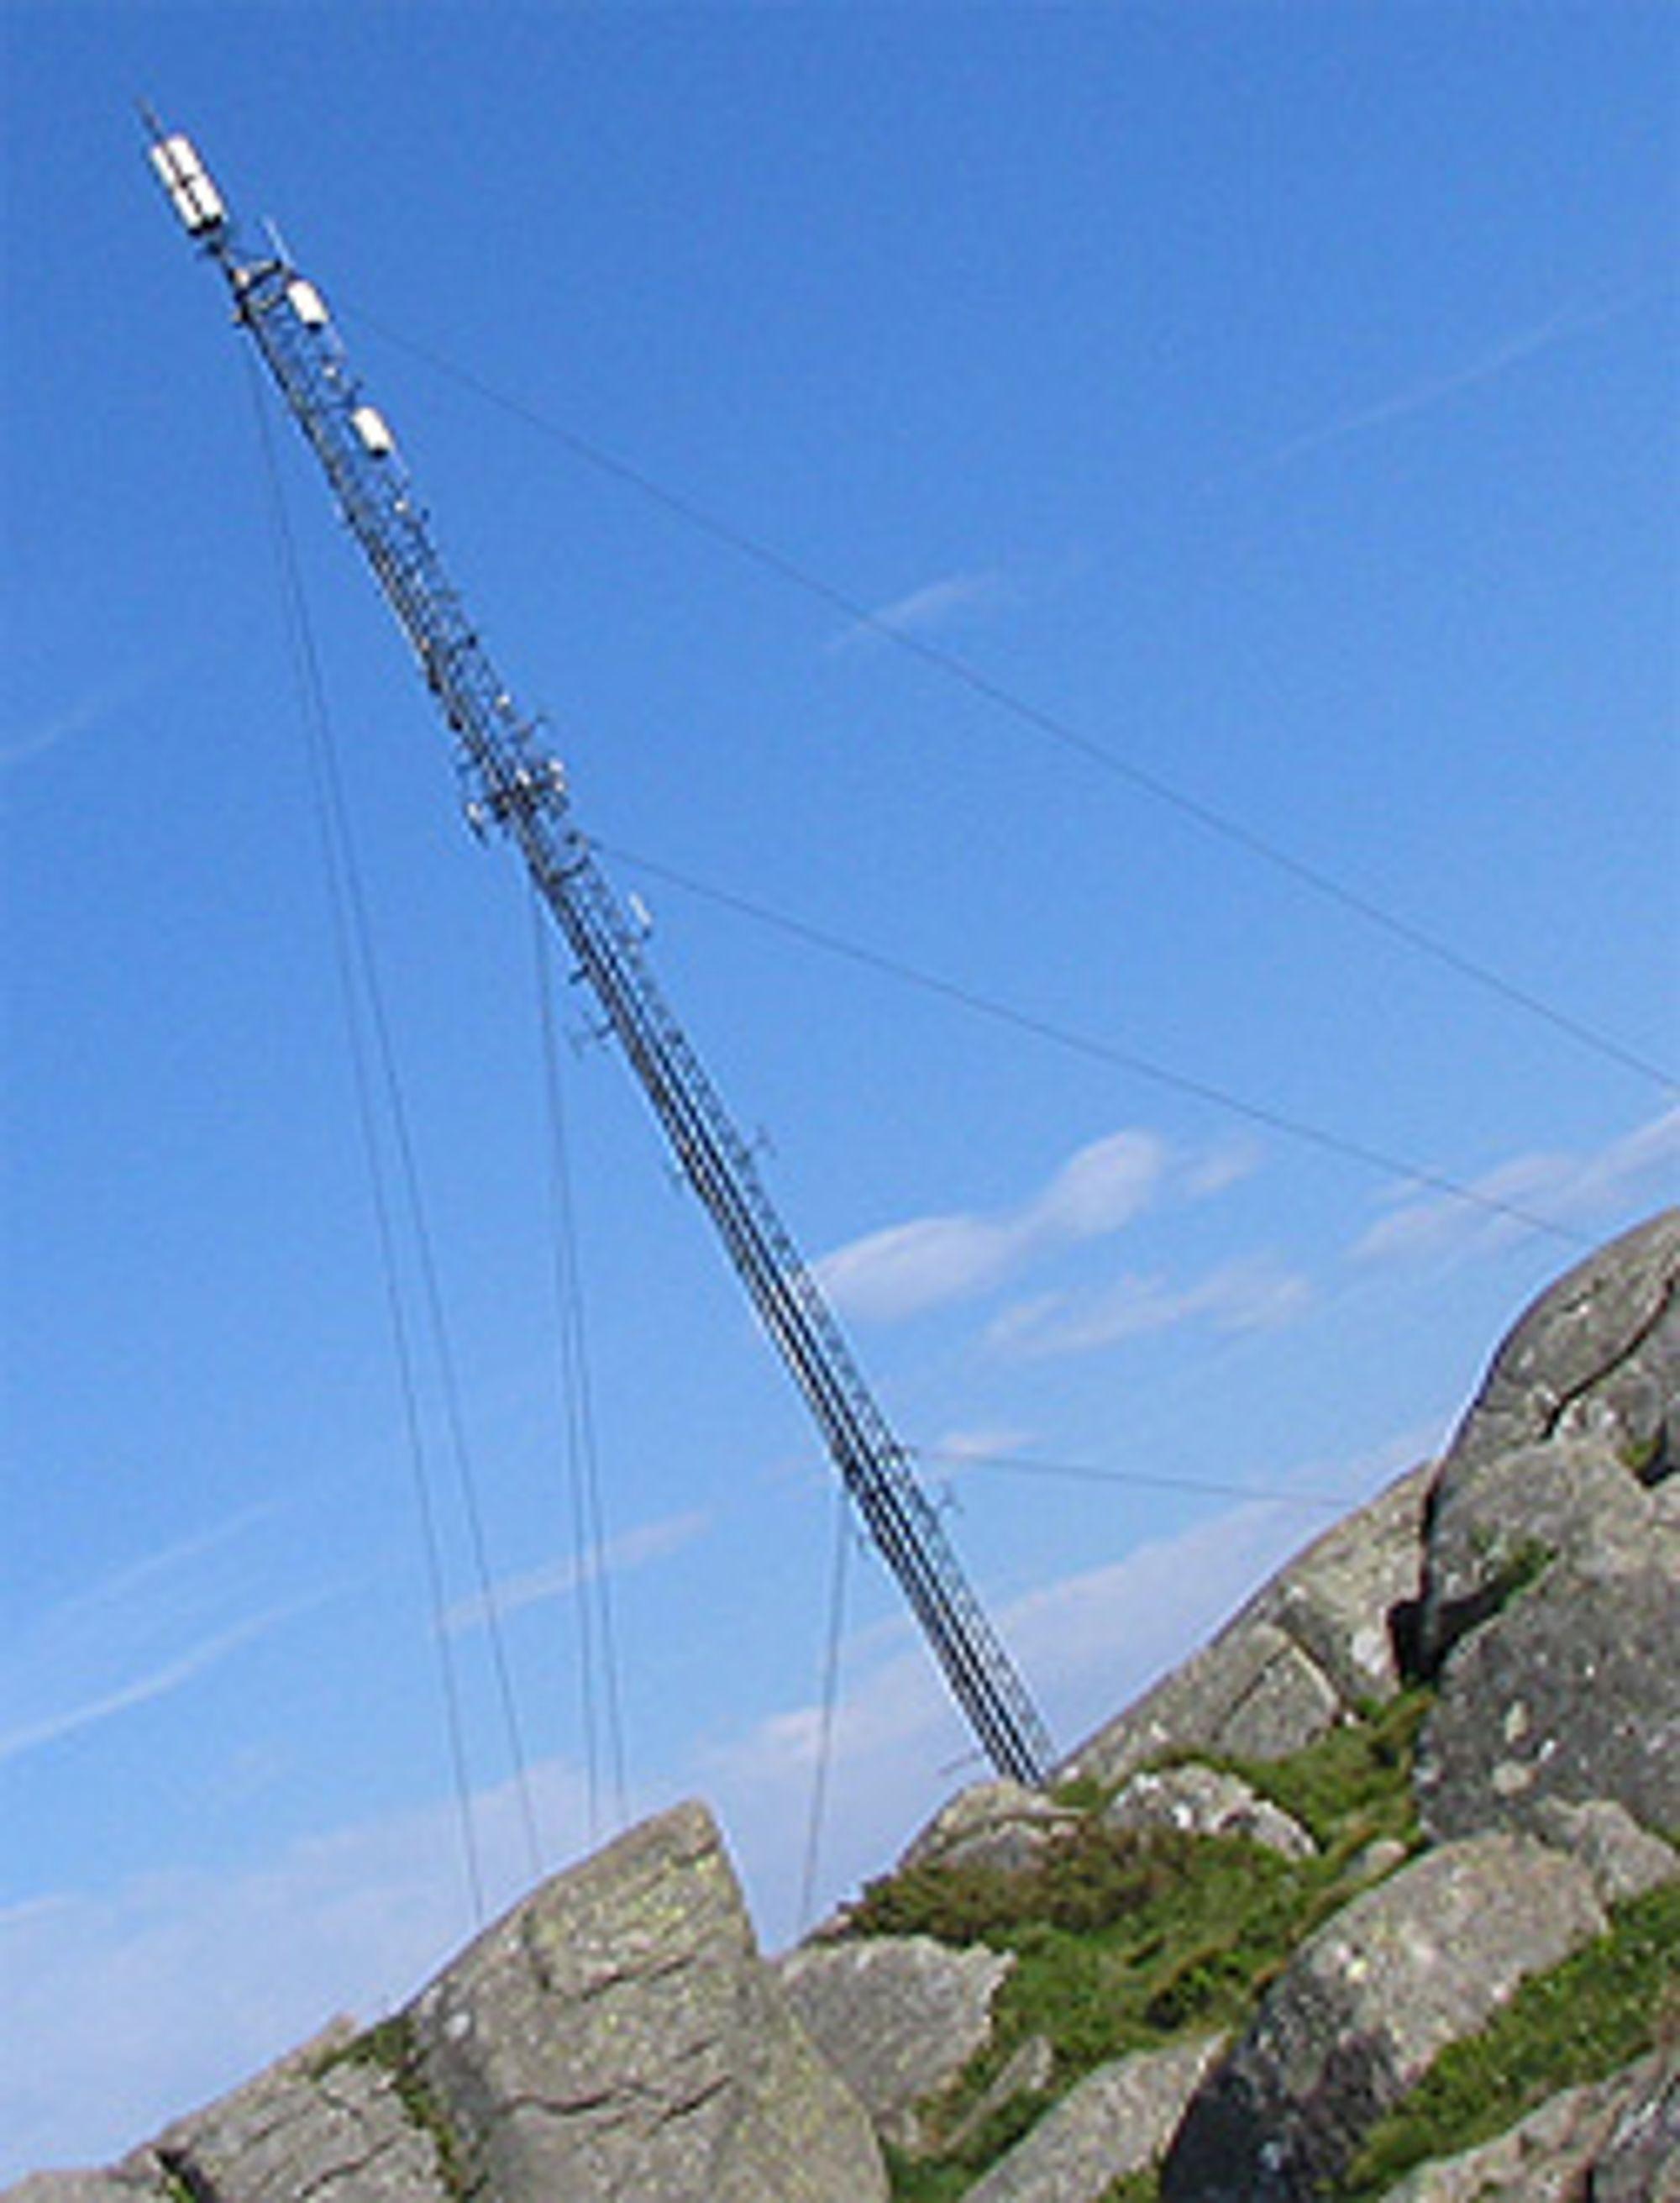 Det er trøbbel i tårnet hos Telenor. (Foto: Marius Valle)